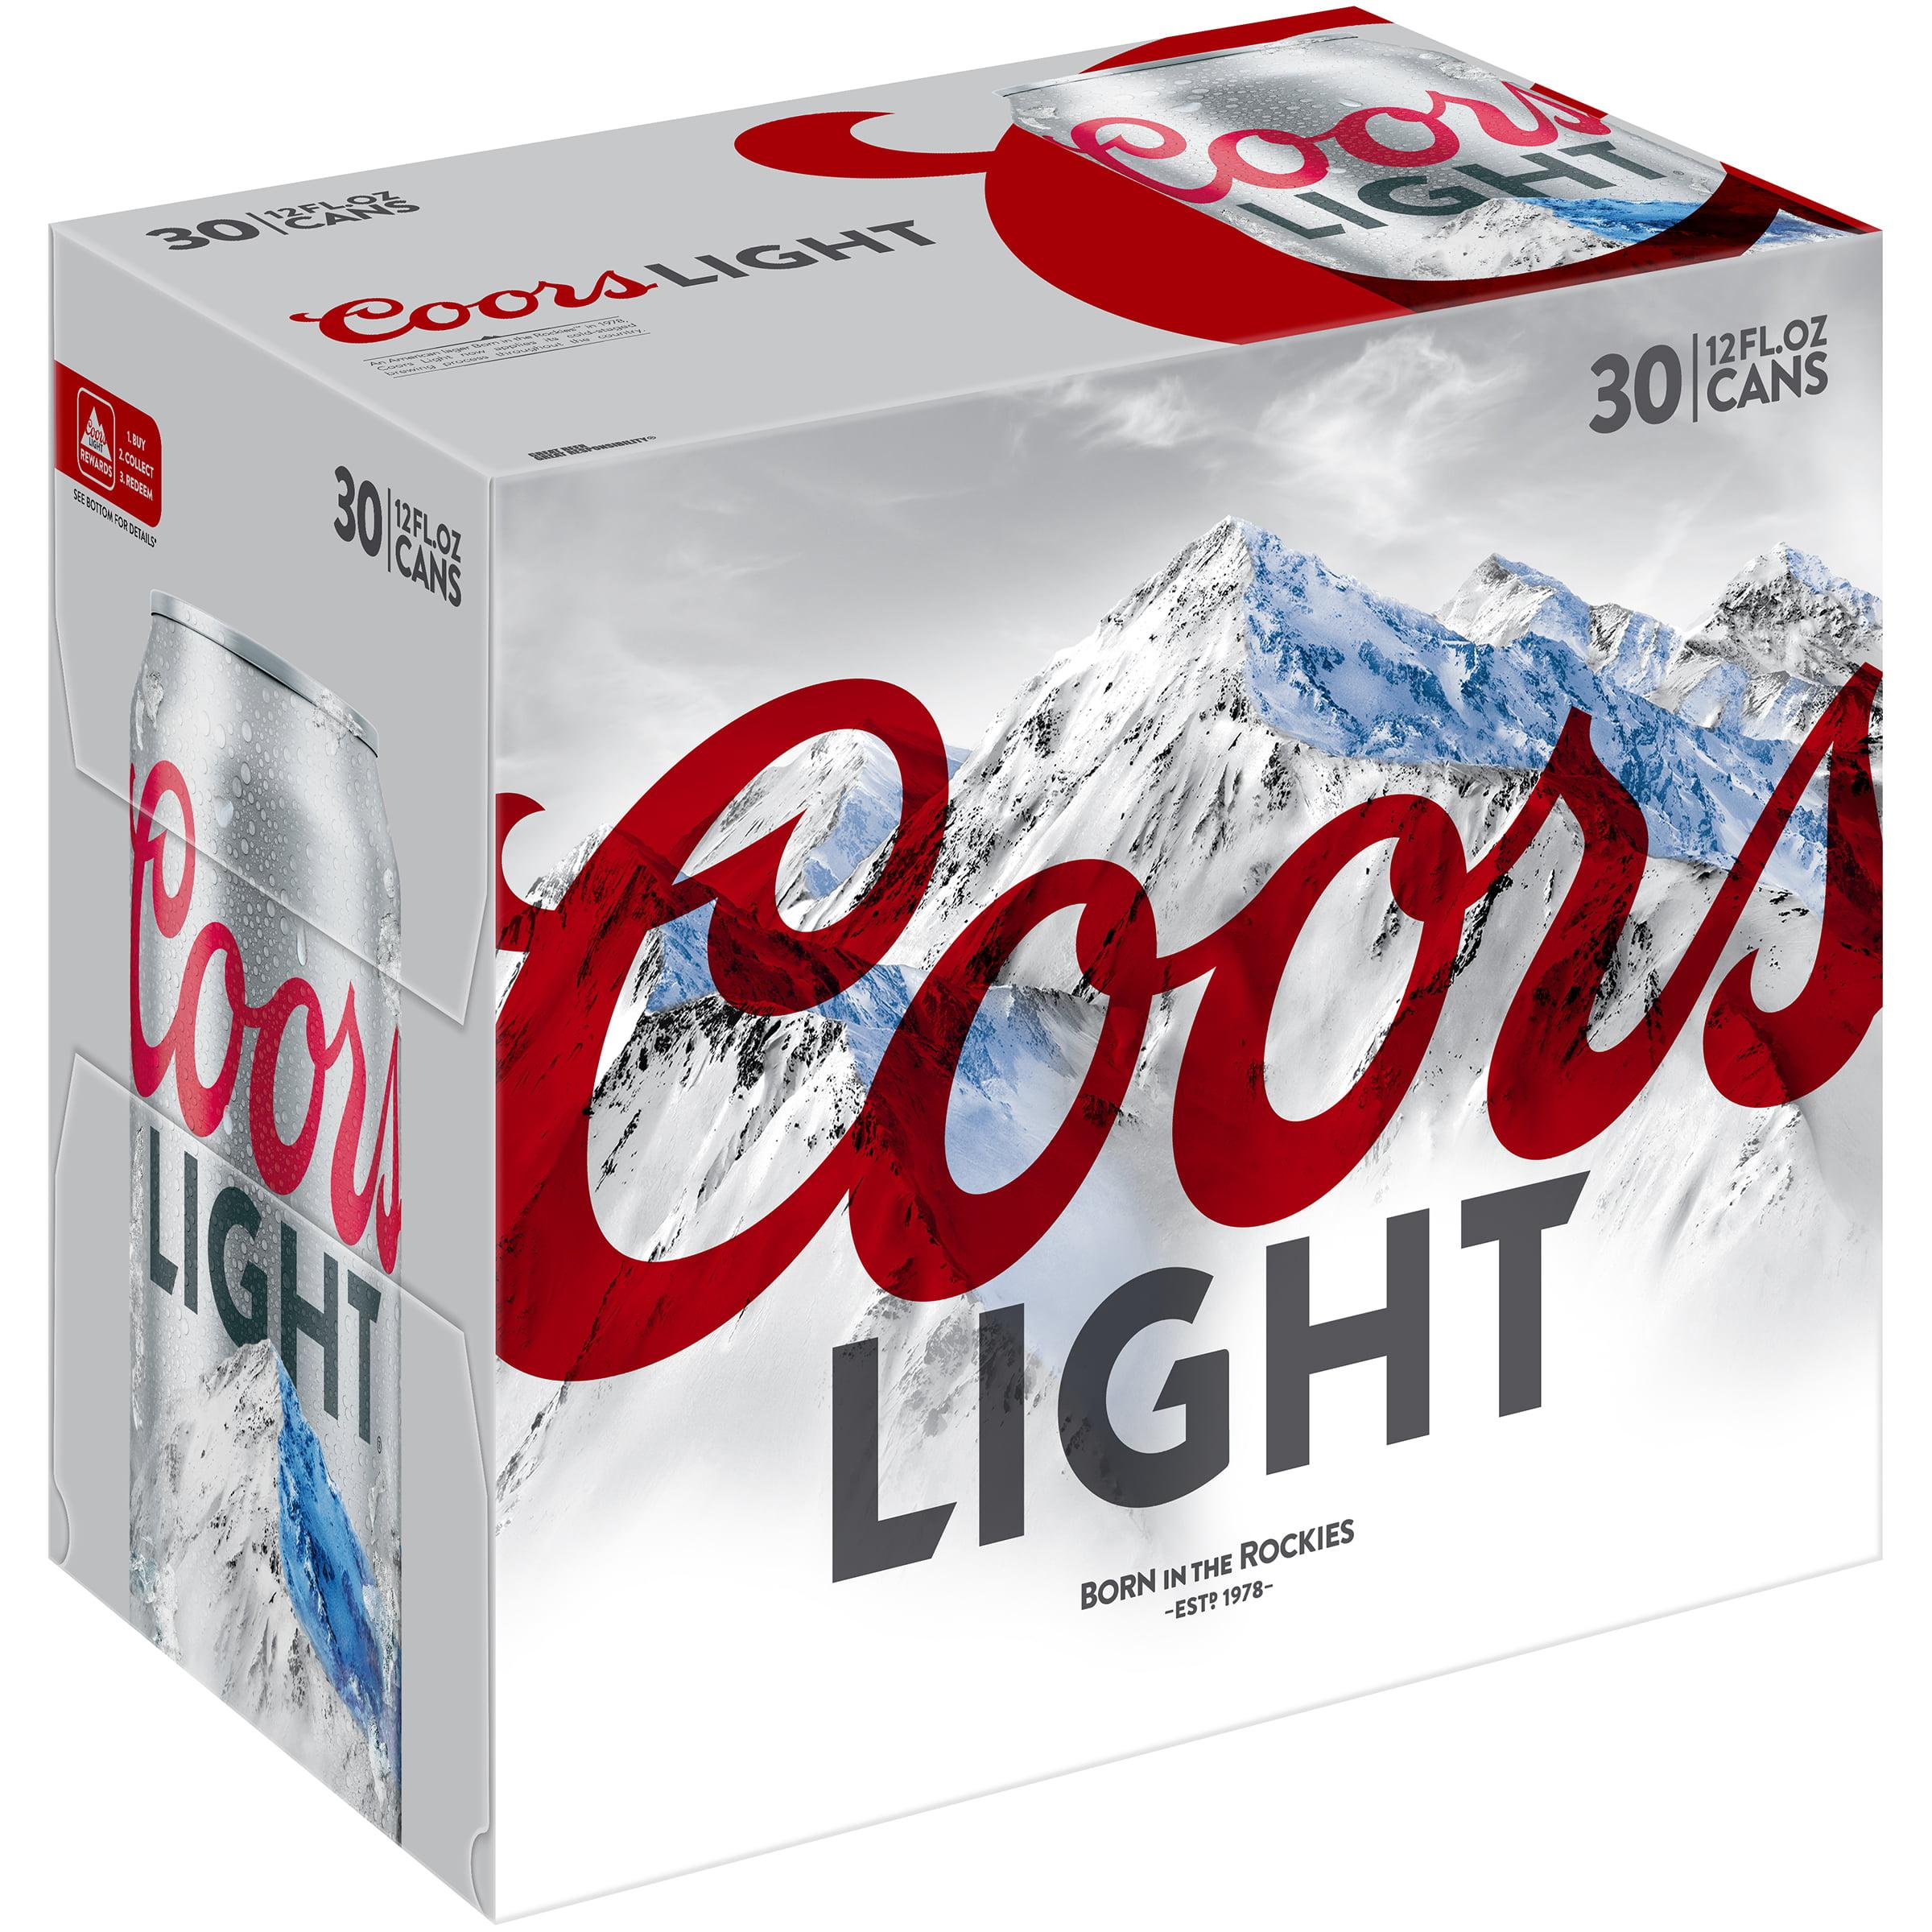 Coors Light Lager Beer, 30 Pack, 12 fl. oz. Cans, 4.2% ABV